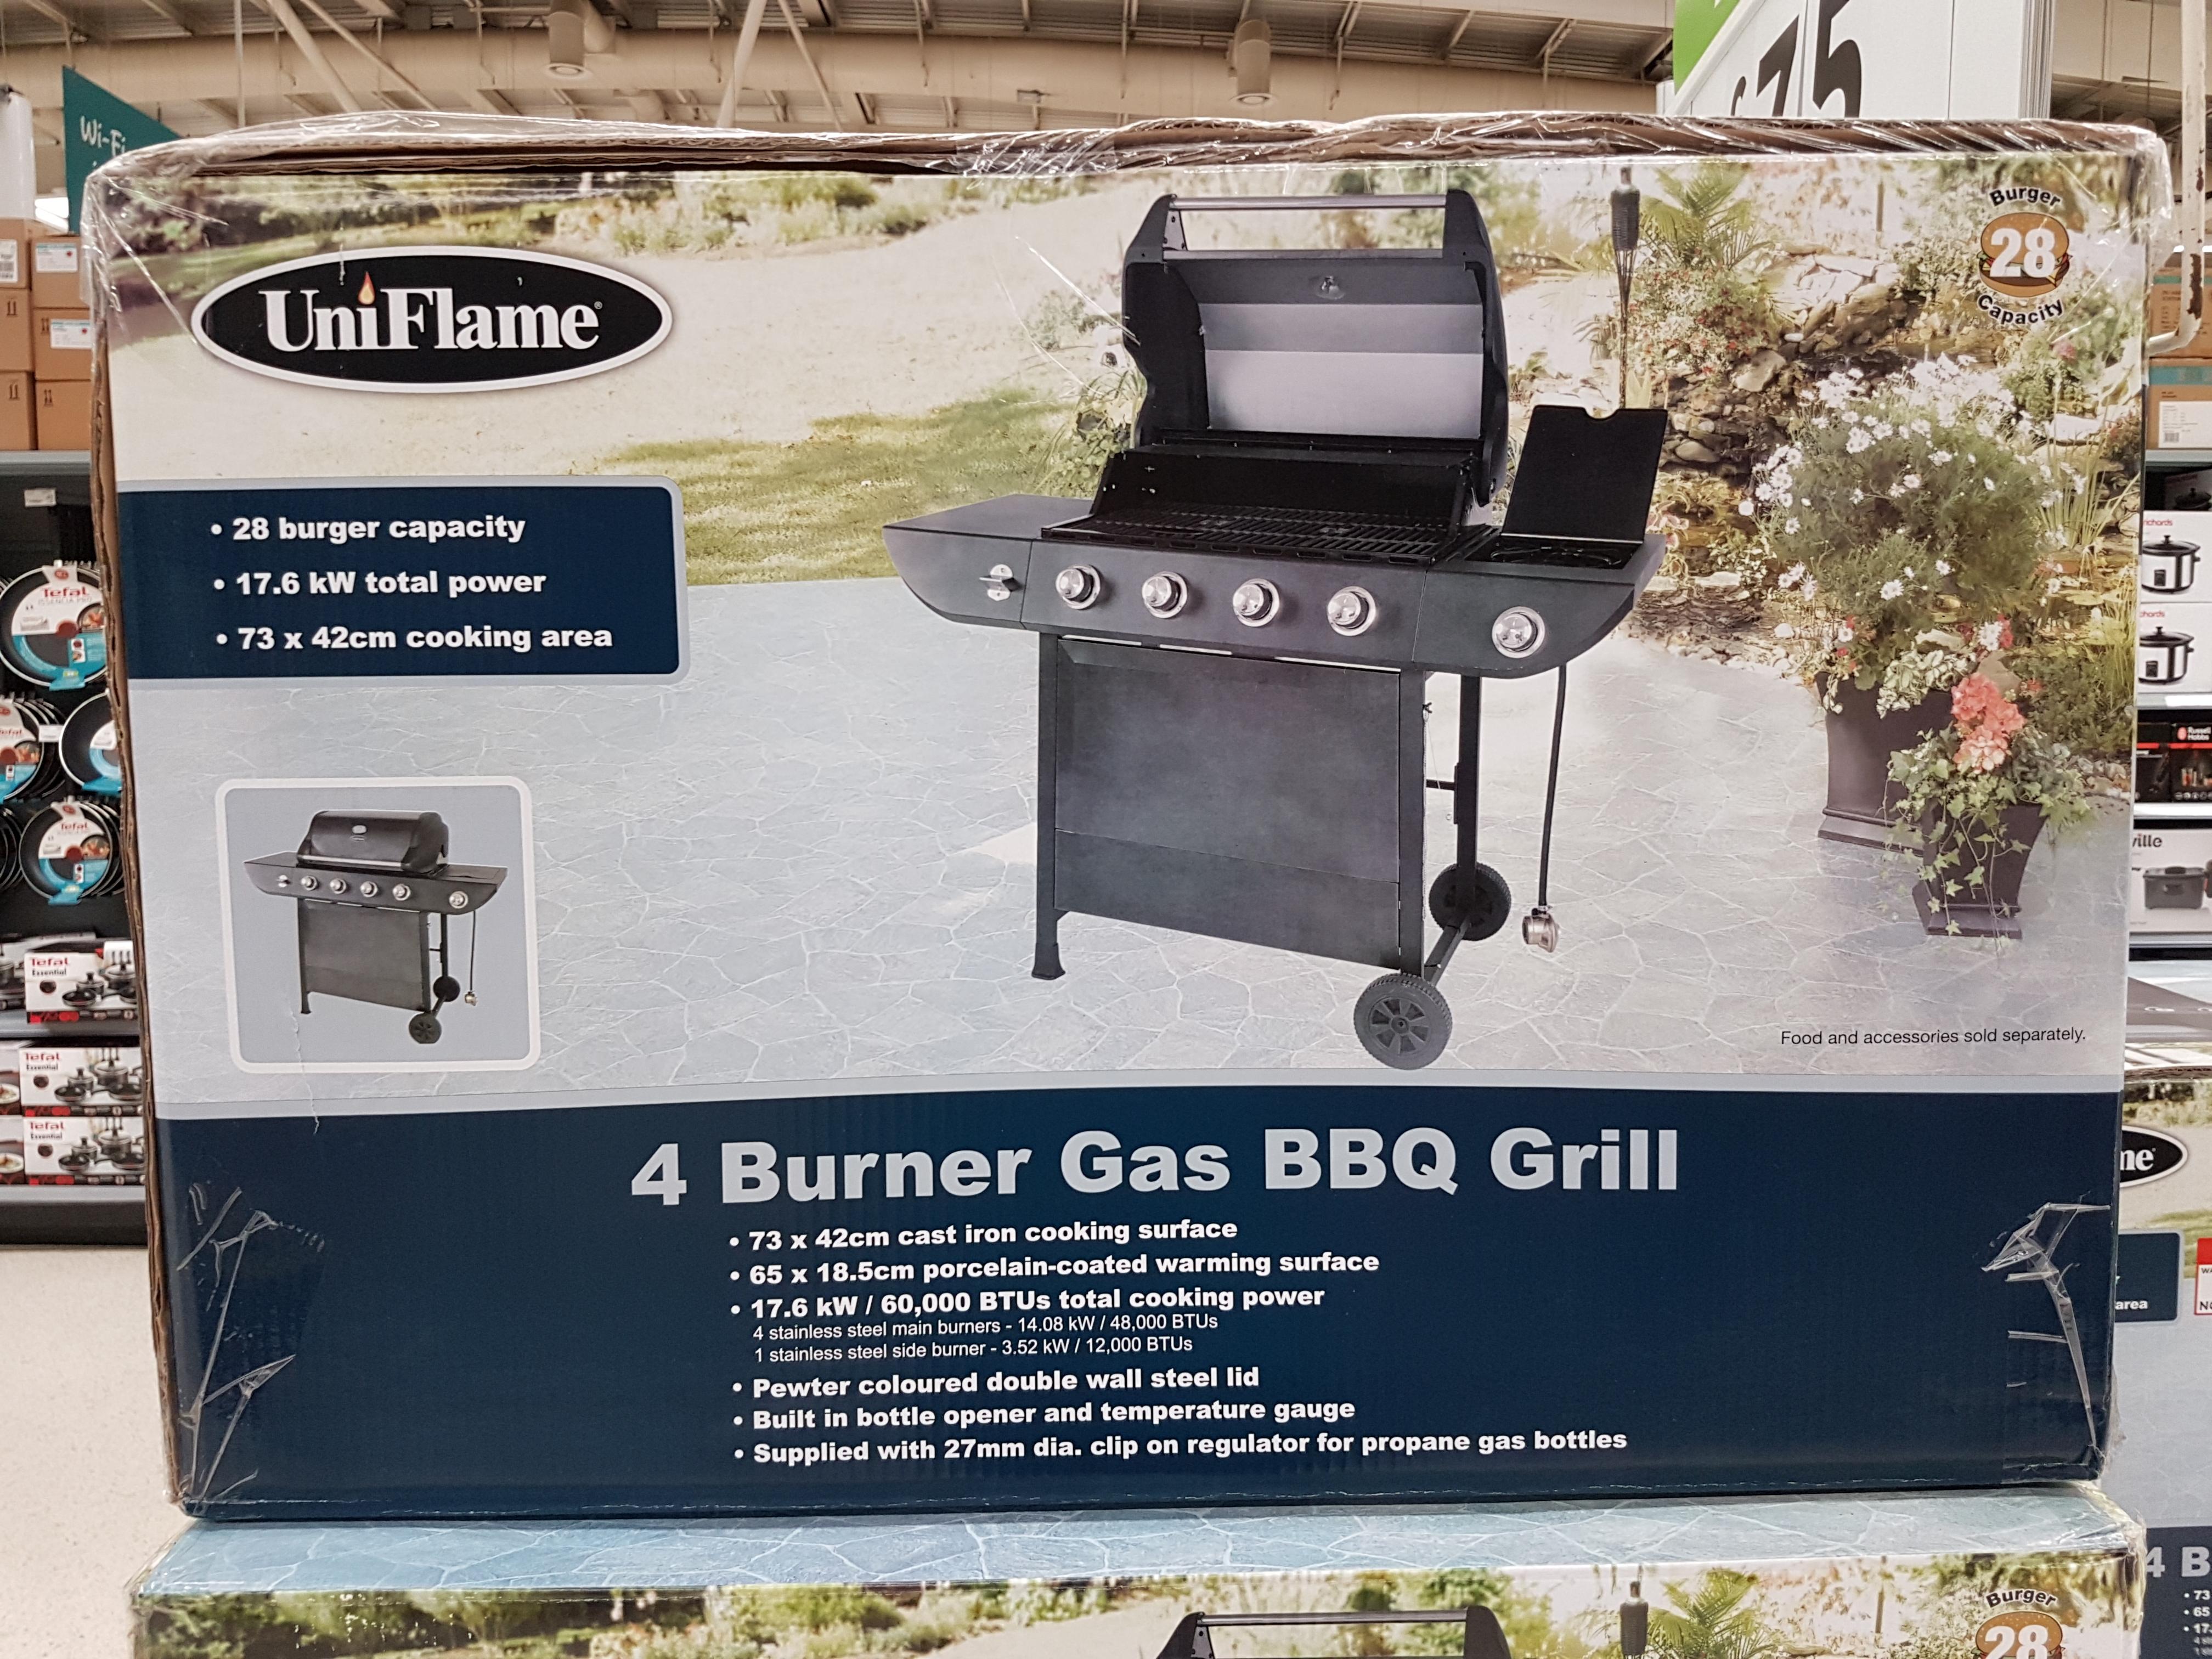 asda govan uni flame 4 burner gas bbq - £75